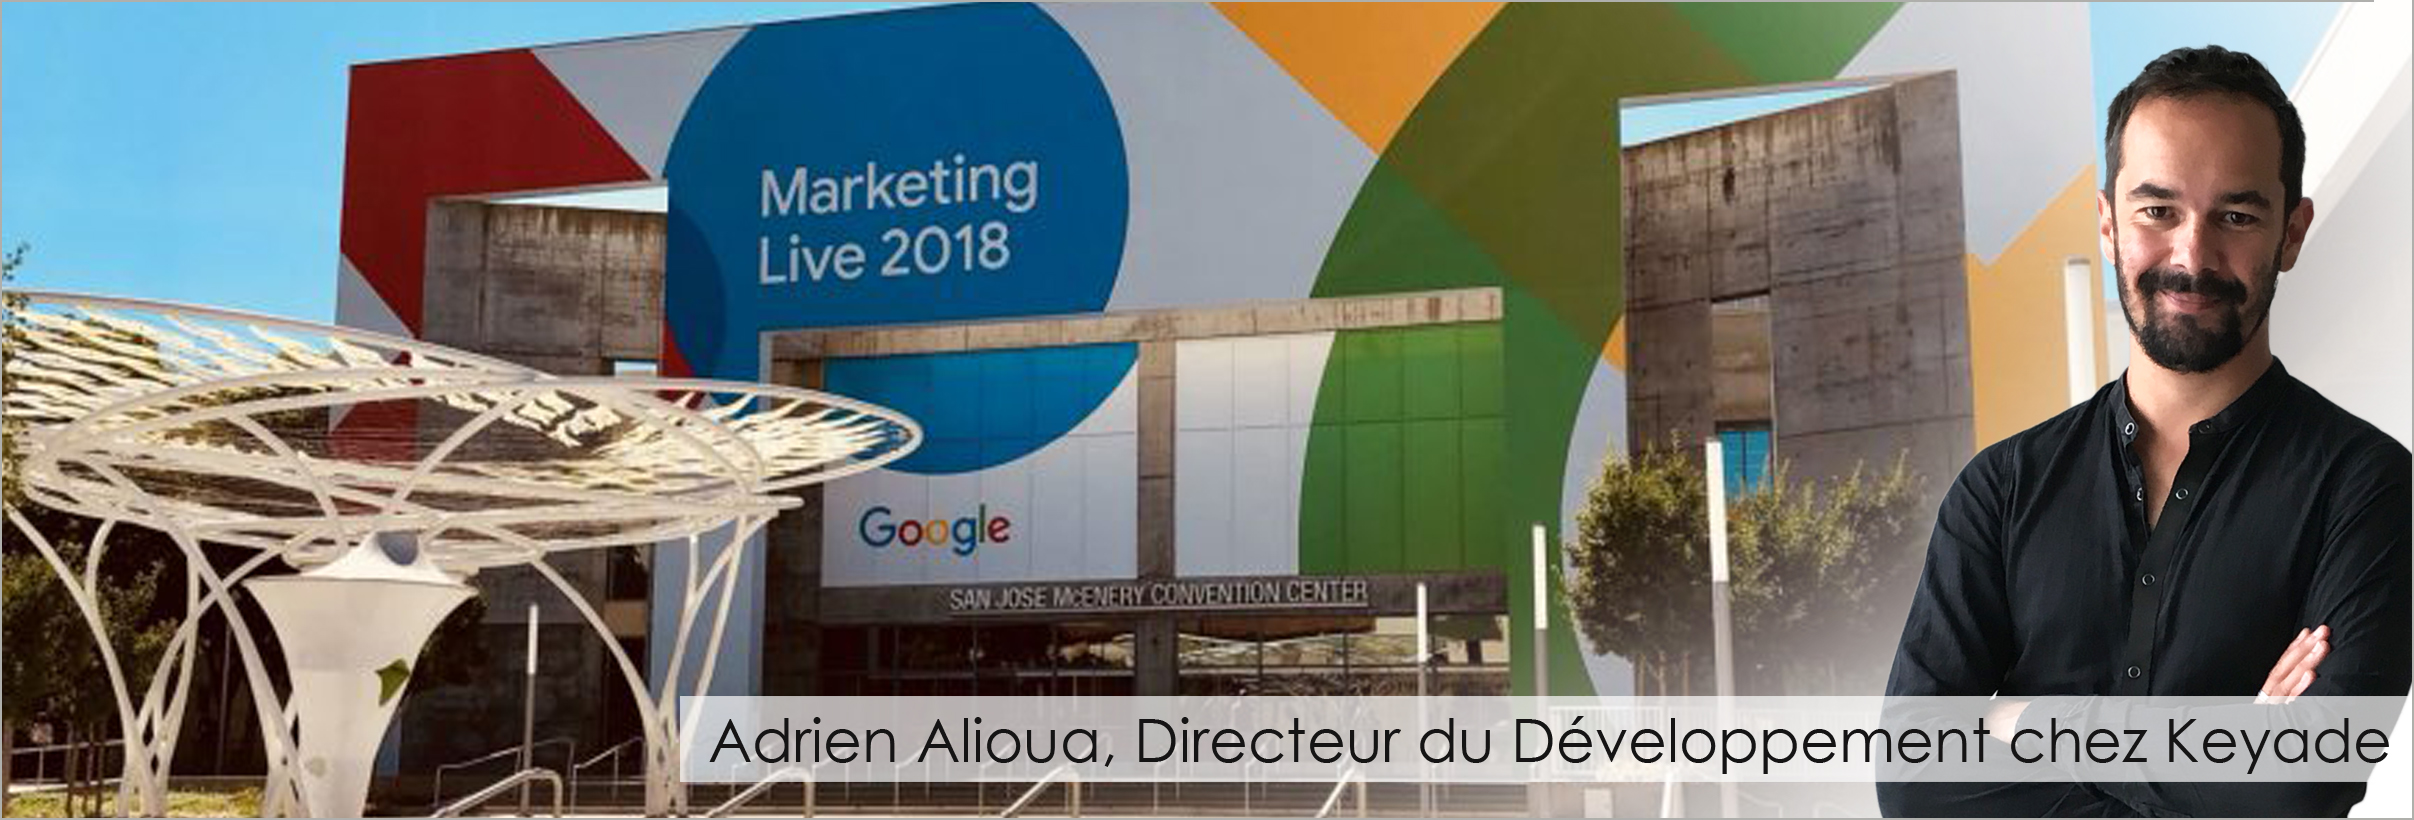 Adrien at Google Marketing Live 3